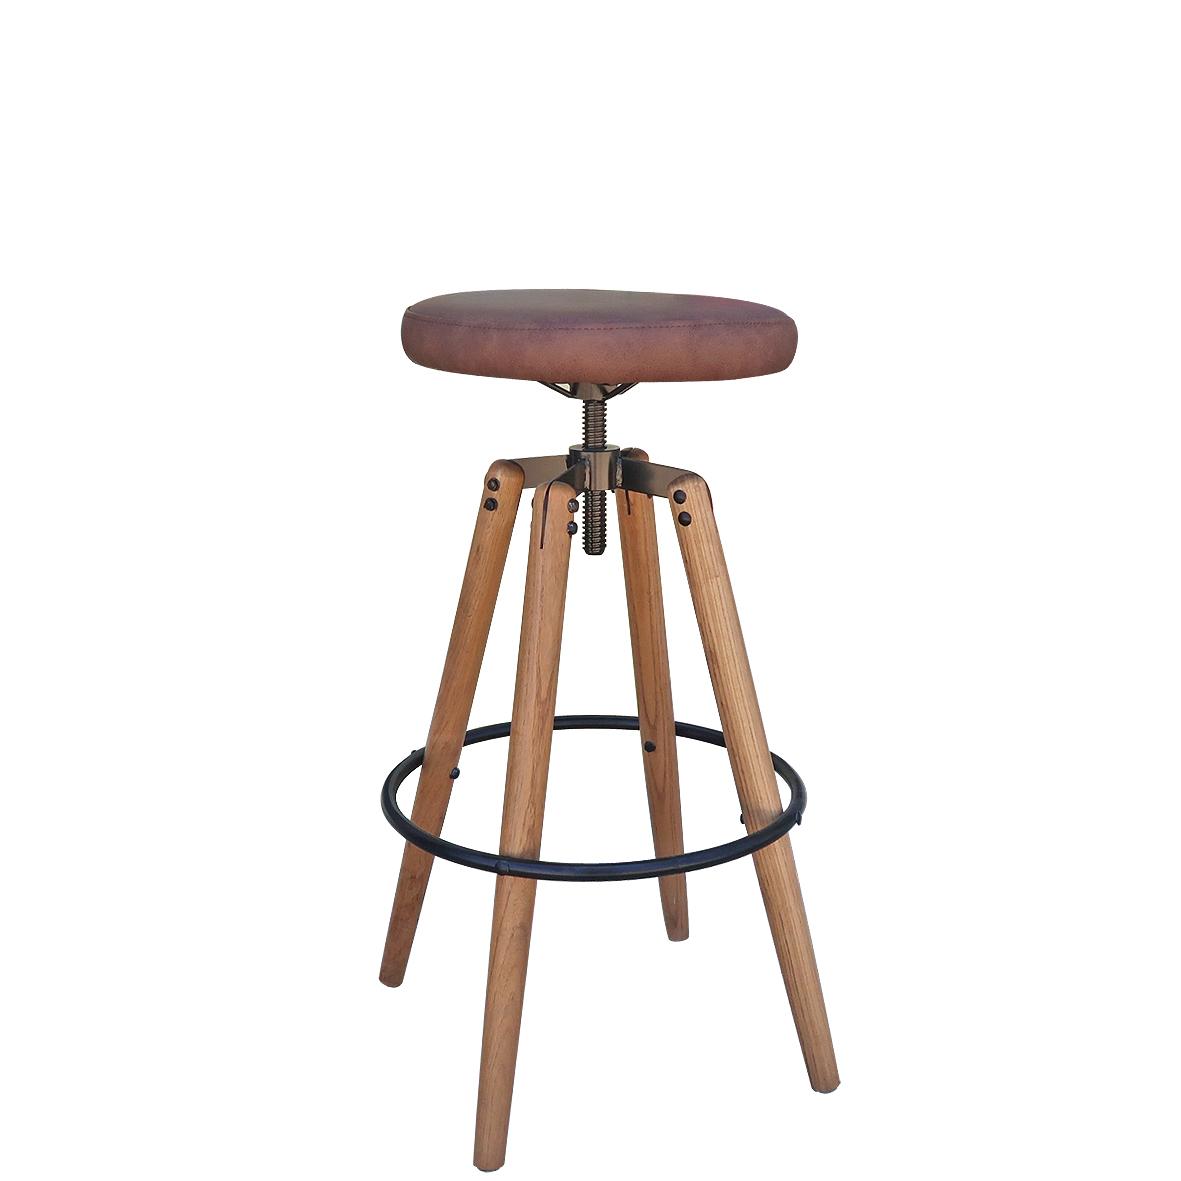 Admirable Bar Stools In Perth Timber Breakfast Kitchen Bar Stools Inzonedesignstudio Interior Chair Design Inzonedesignstudiocom